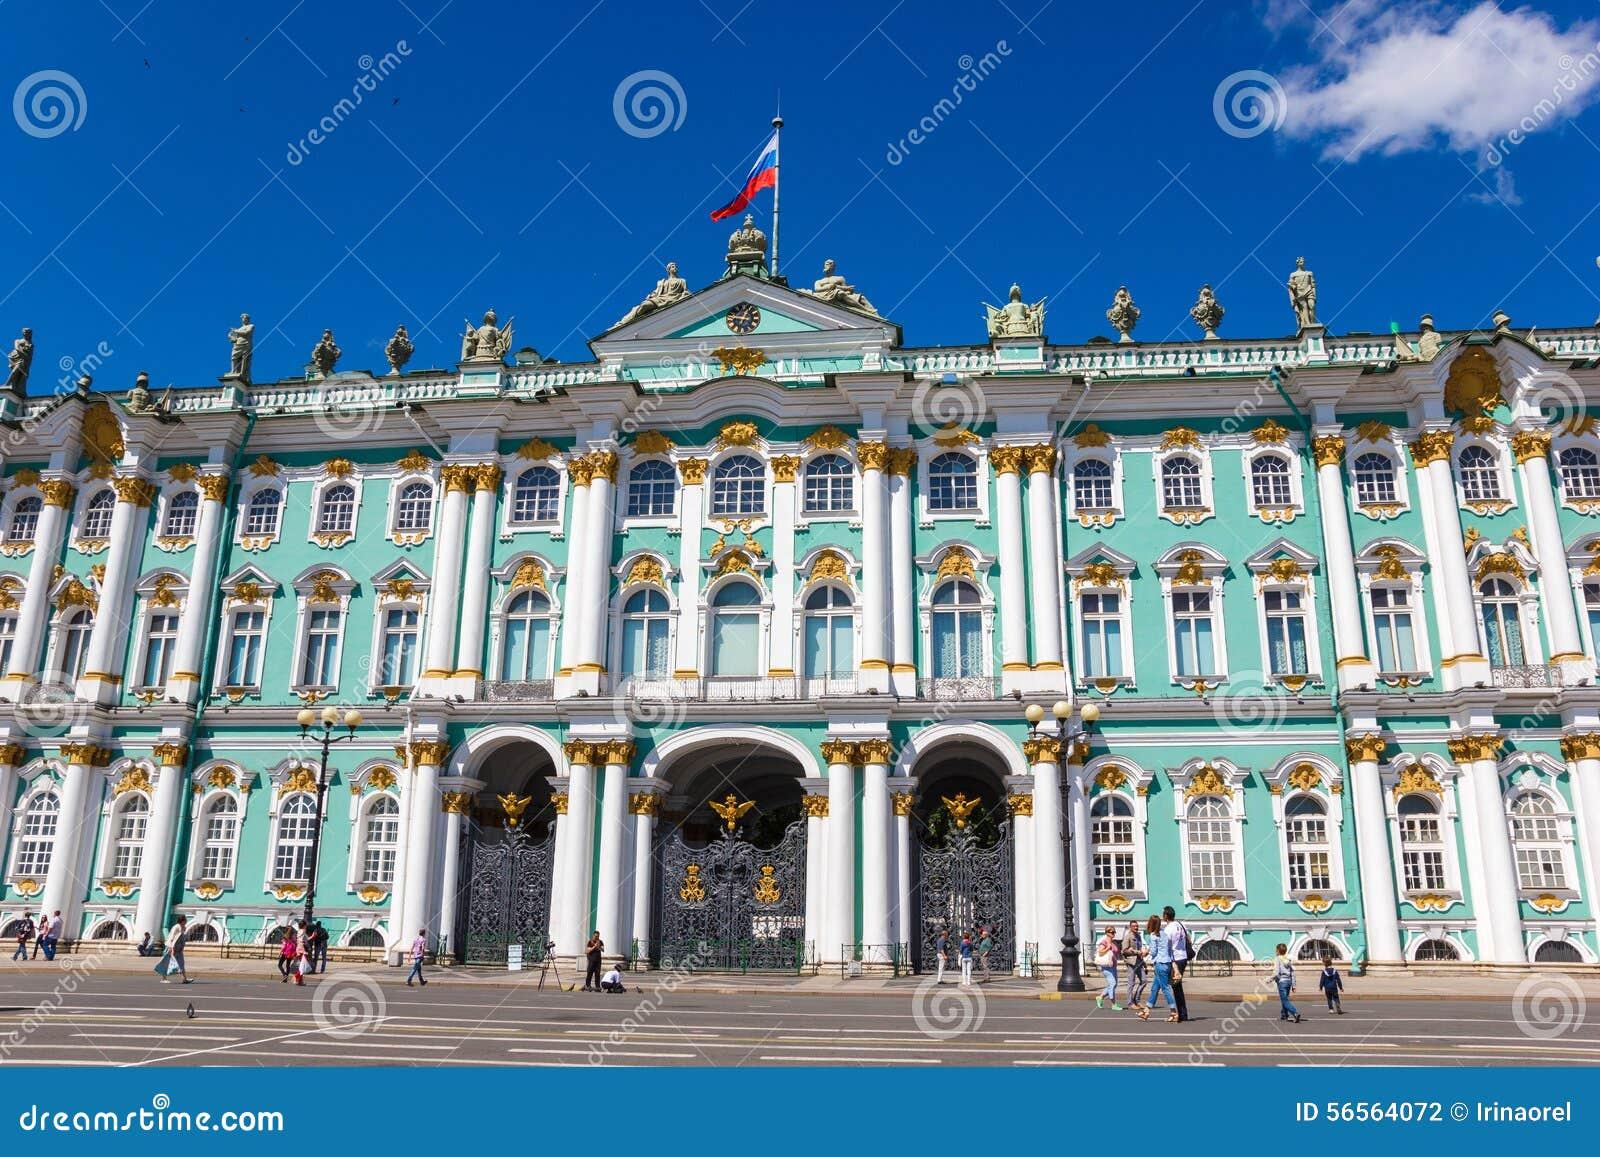 Download Χειμερινό παλάτι (ερημητήριο) Εκδοτική Φωτογραφία - εικόνα από αρχιτεκτονικής, κάστρο: 56564072